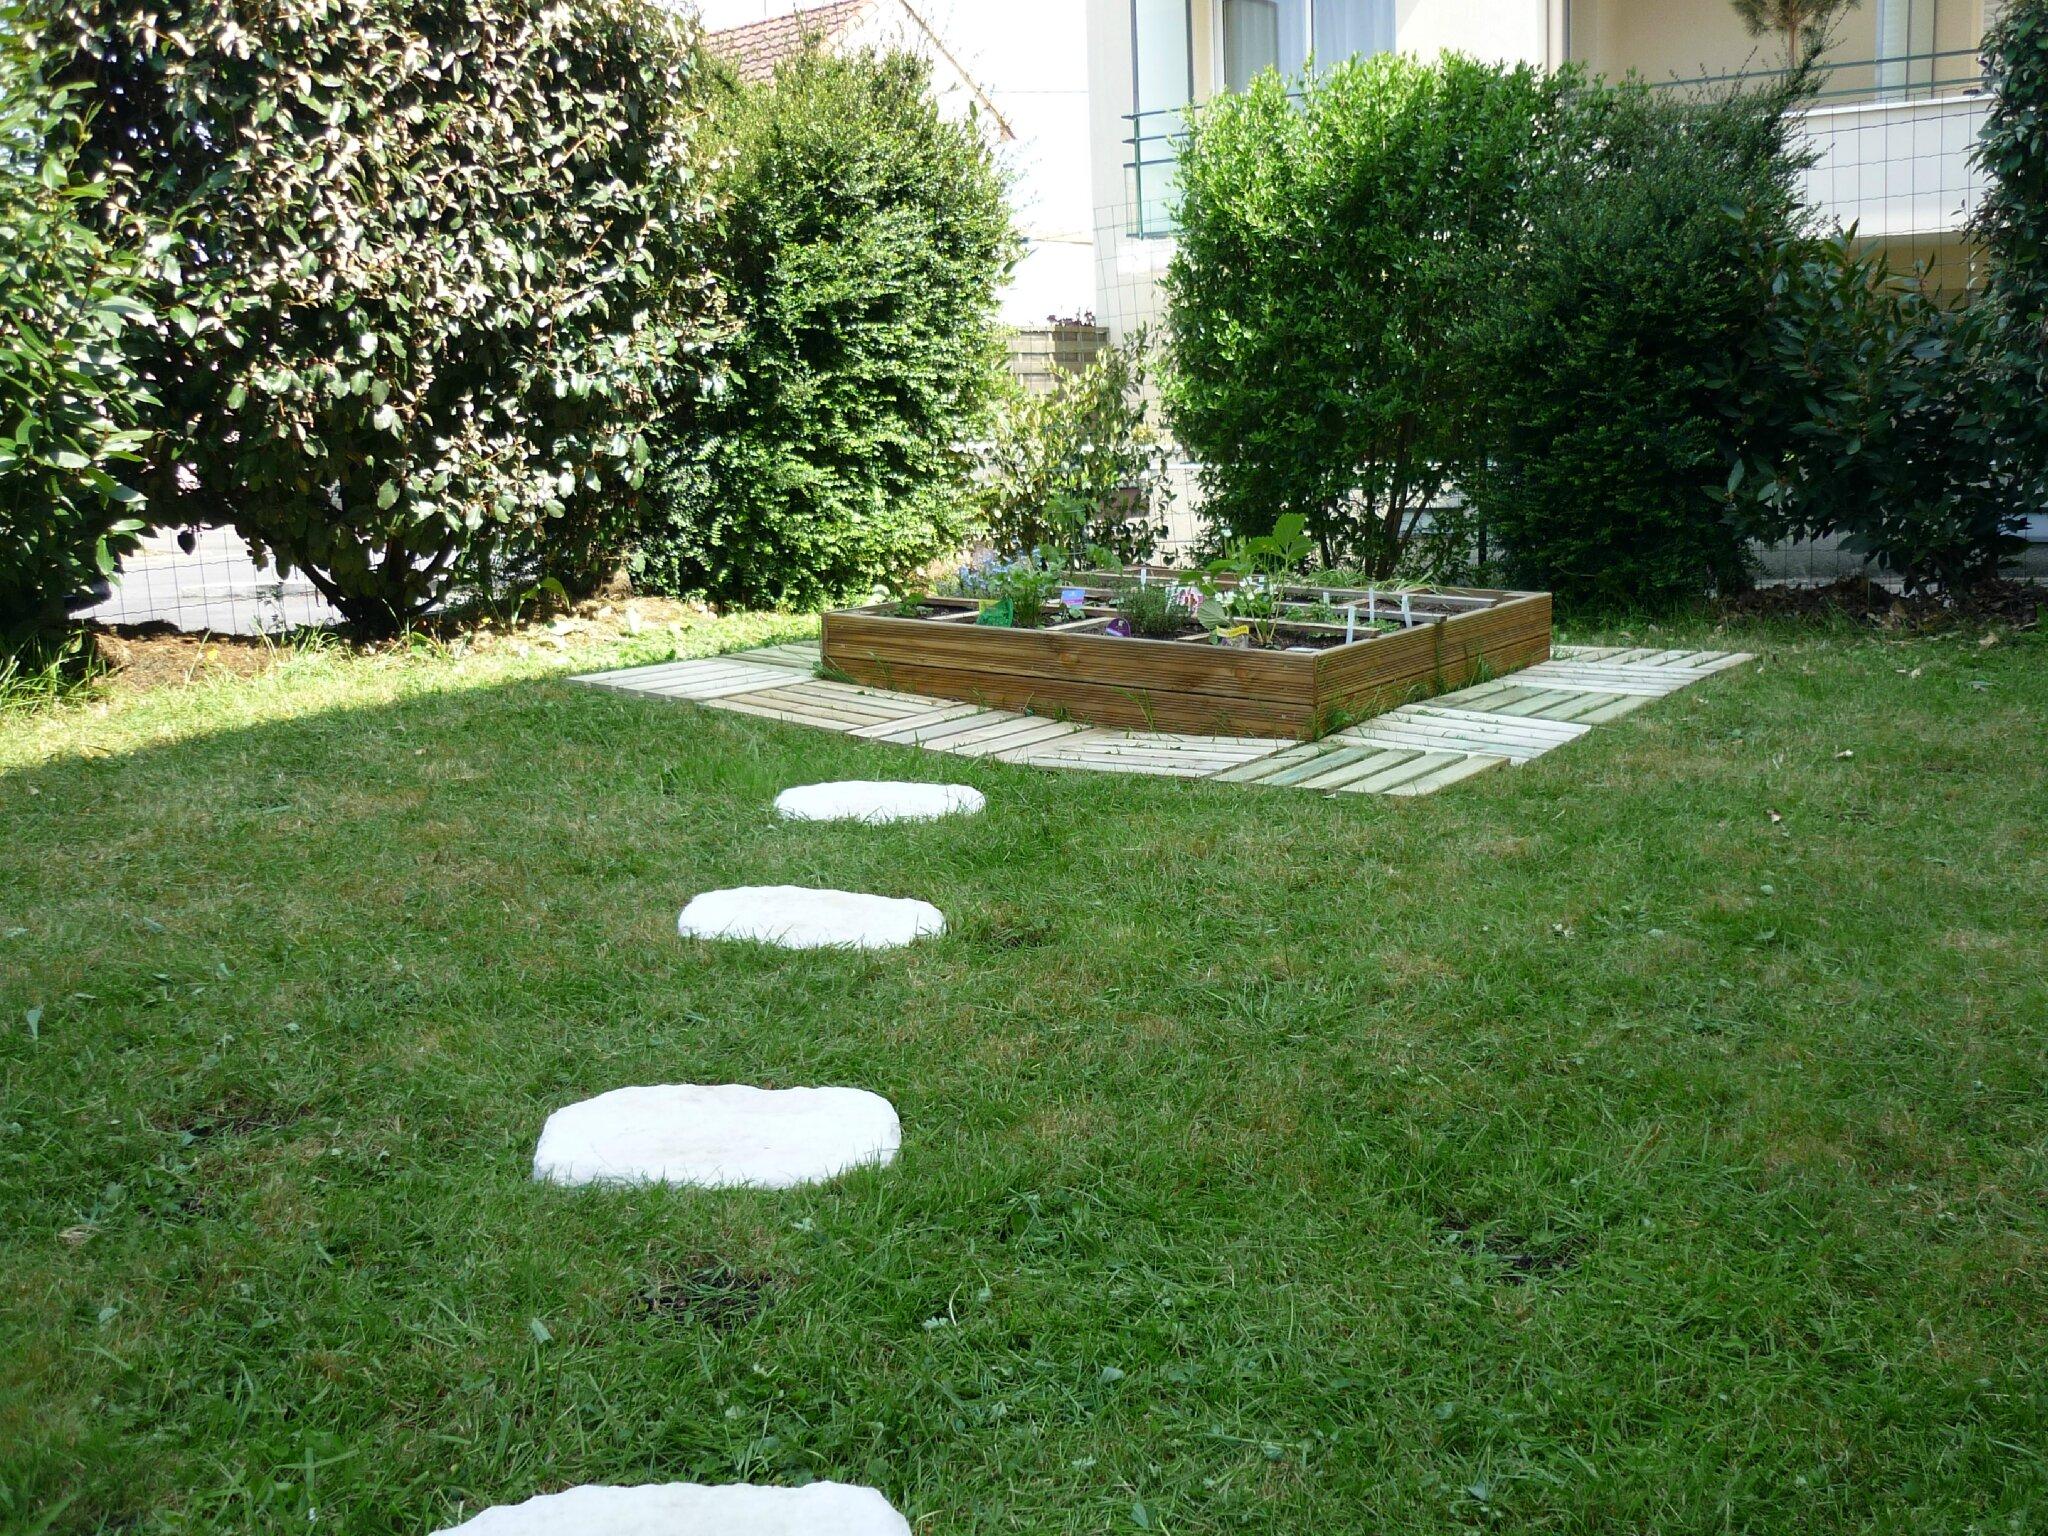 jardin mon beau jardin le journal de miss plumette. Black Bedroom Furniture Sets. Home Design Ideas